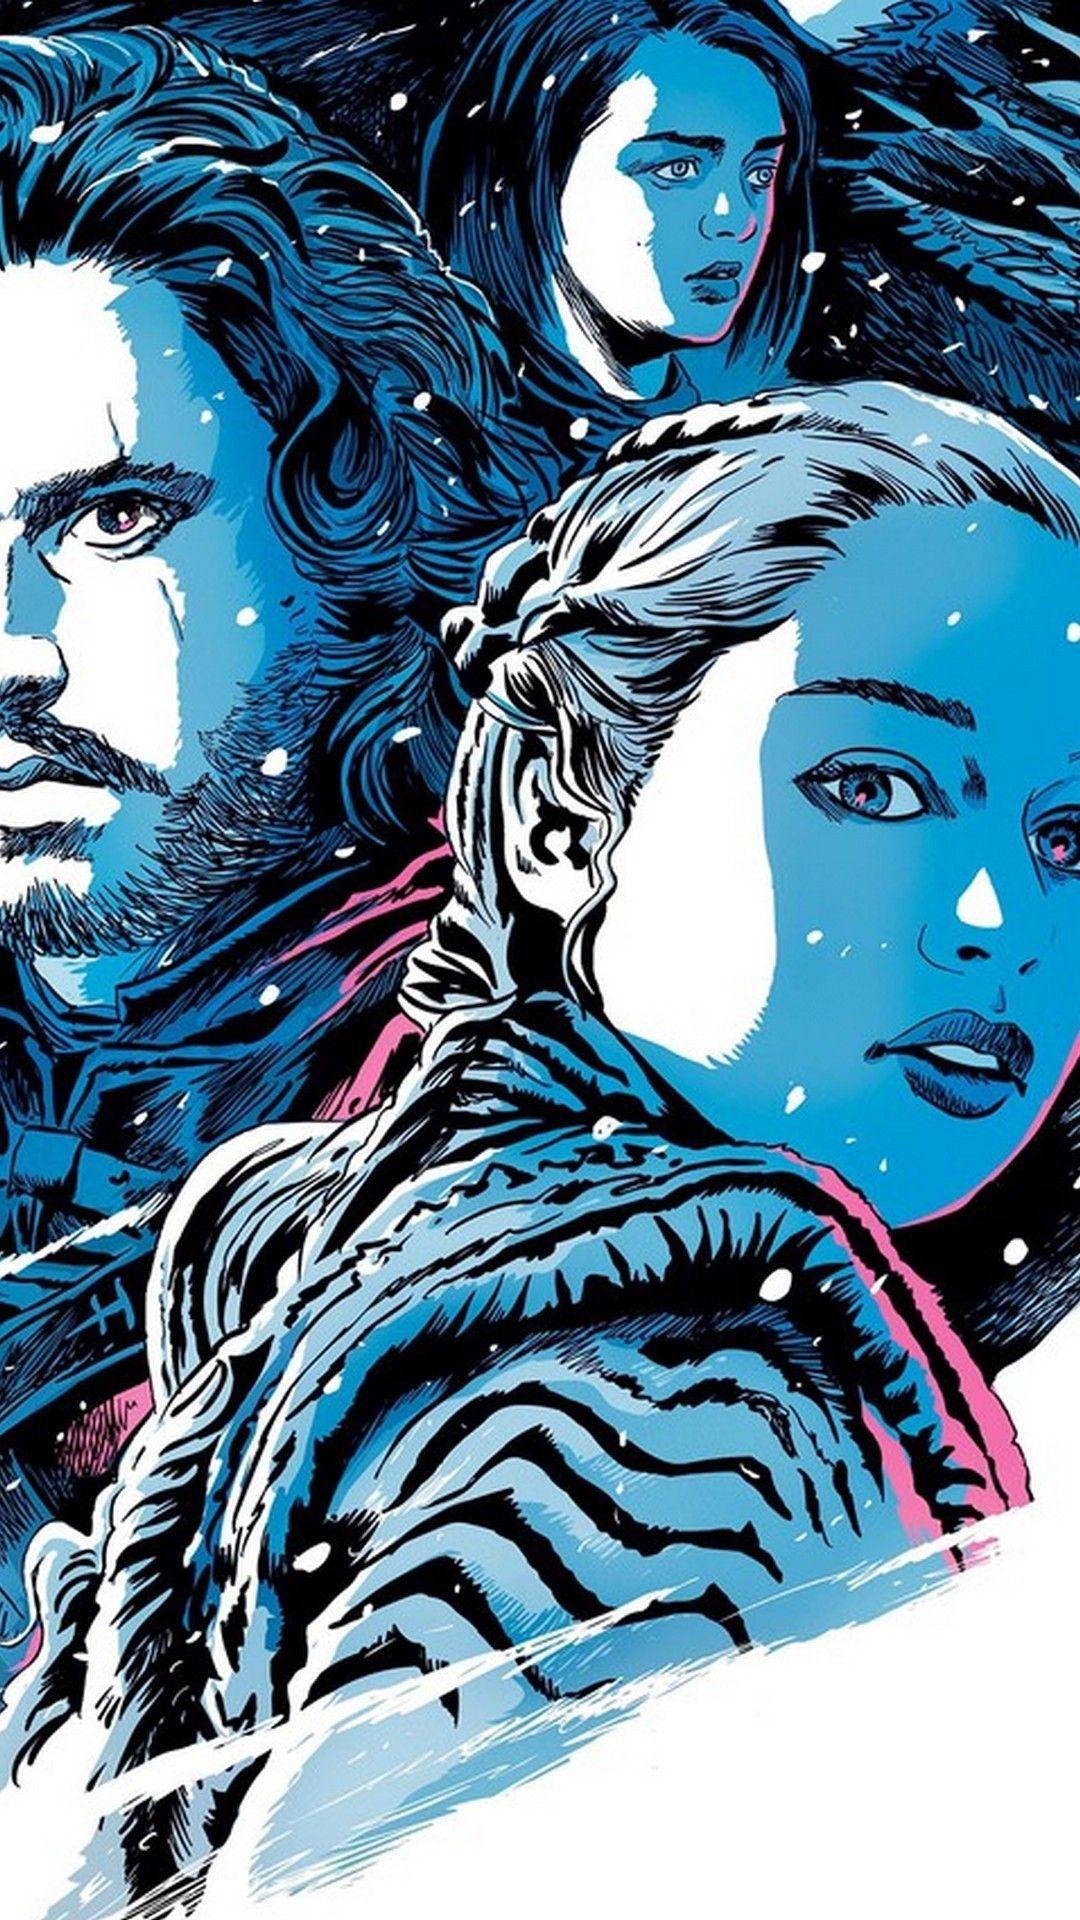 Game of Thrones 8 Season iPhone 7 Wallpaper Iphone 7